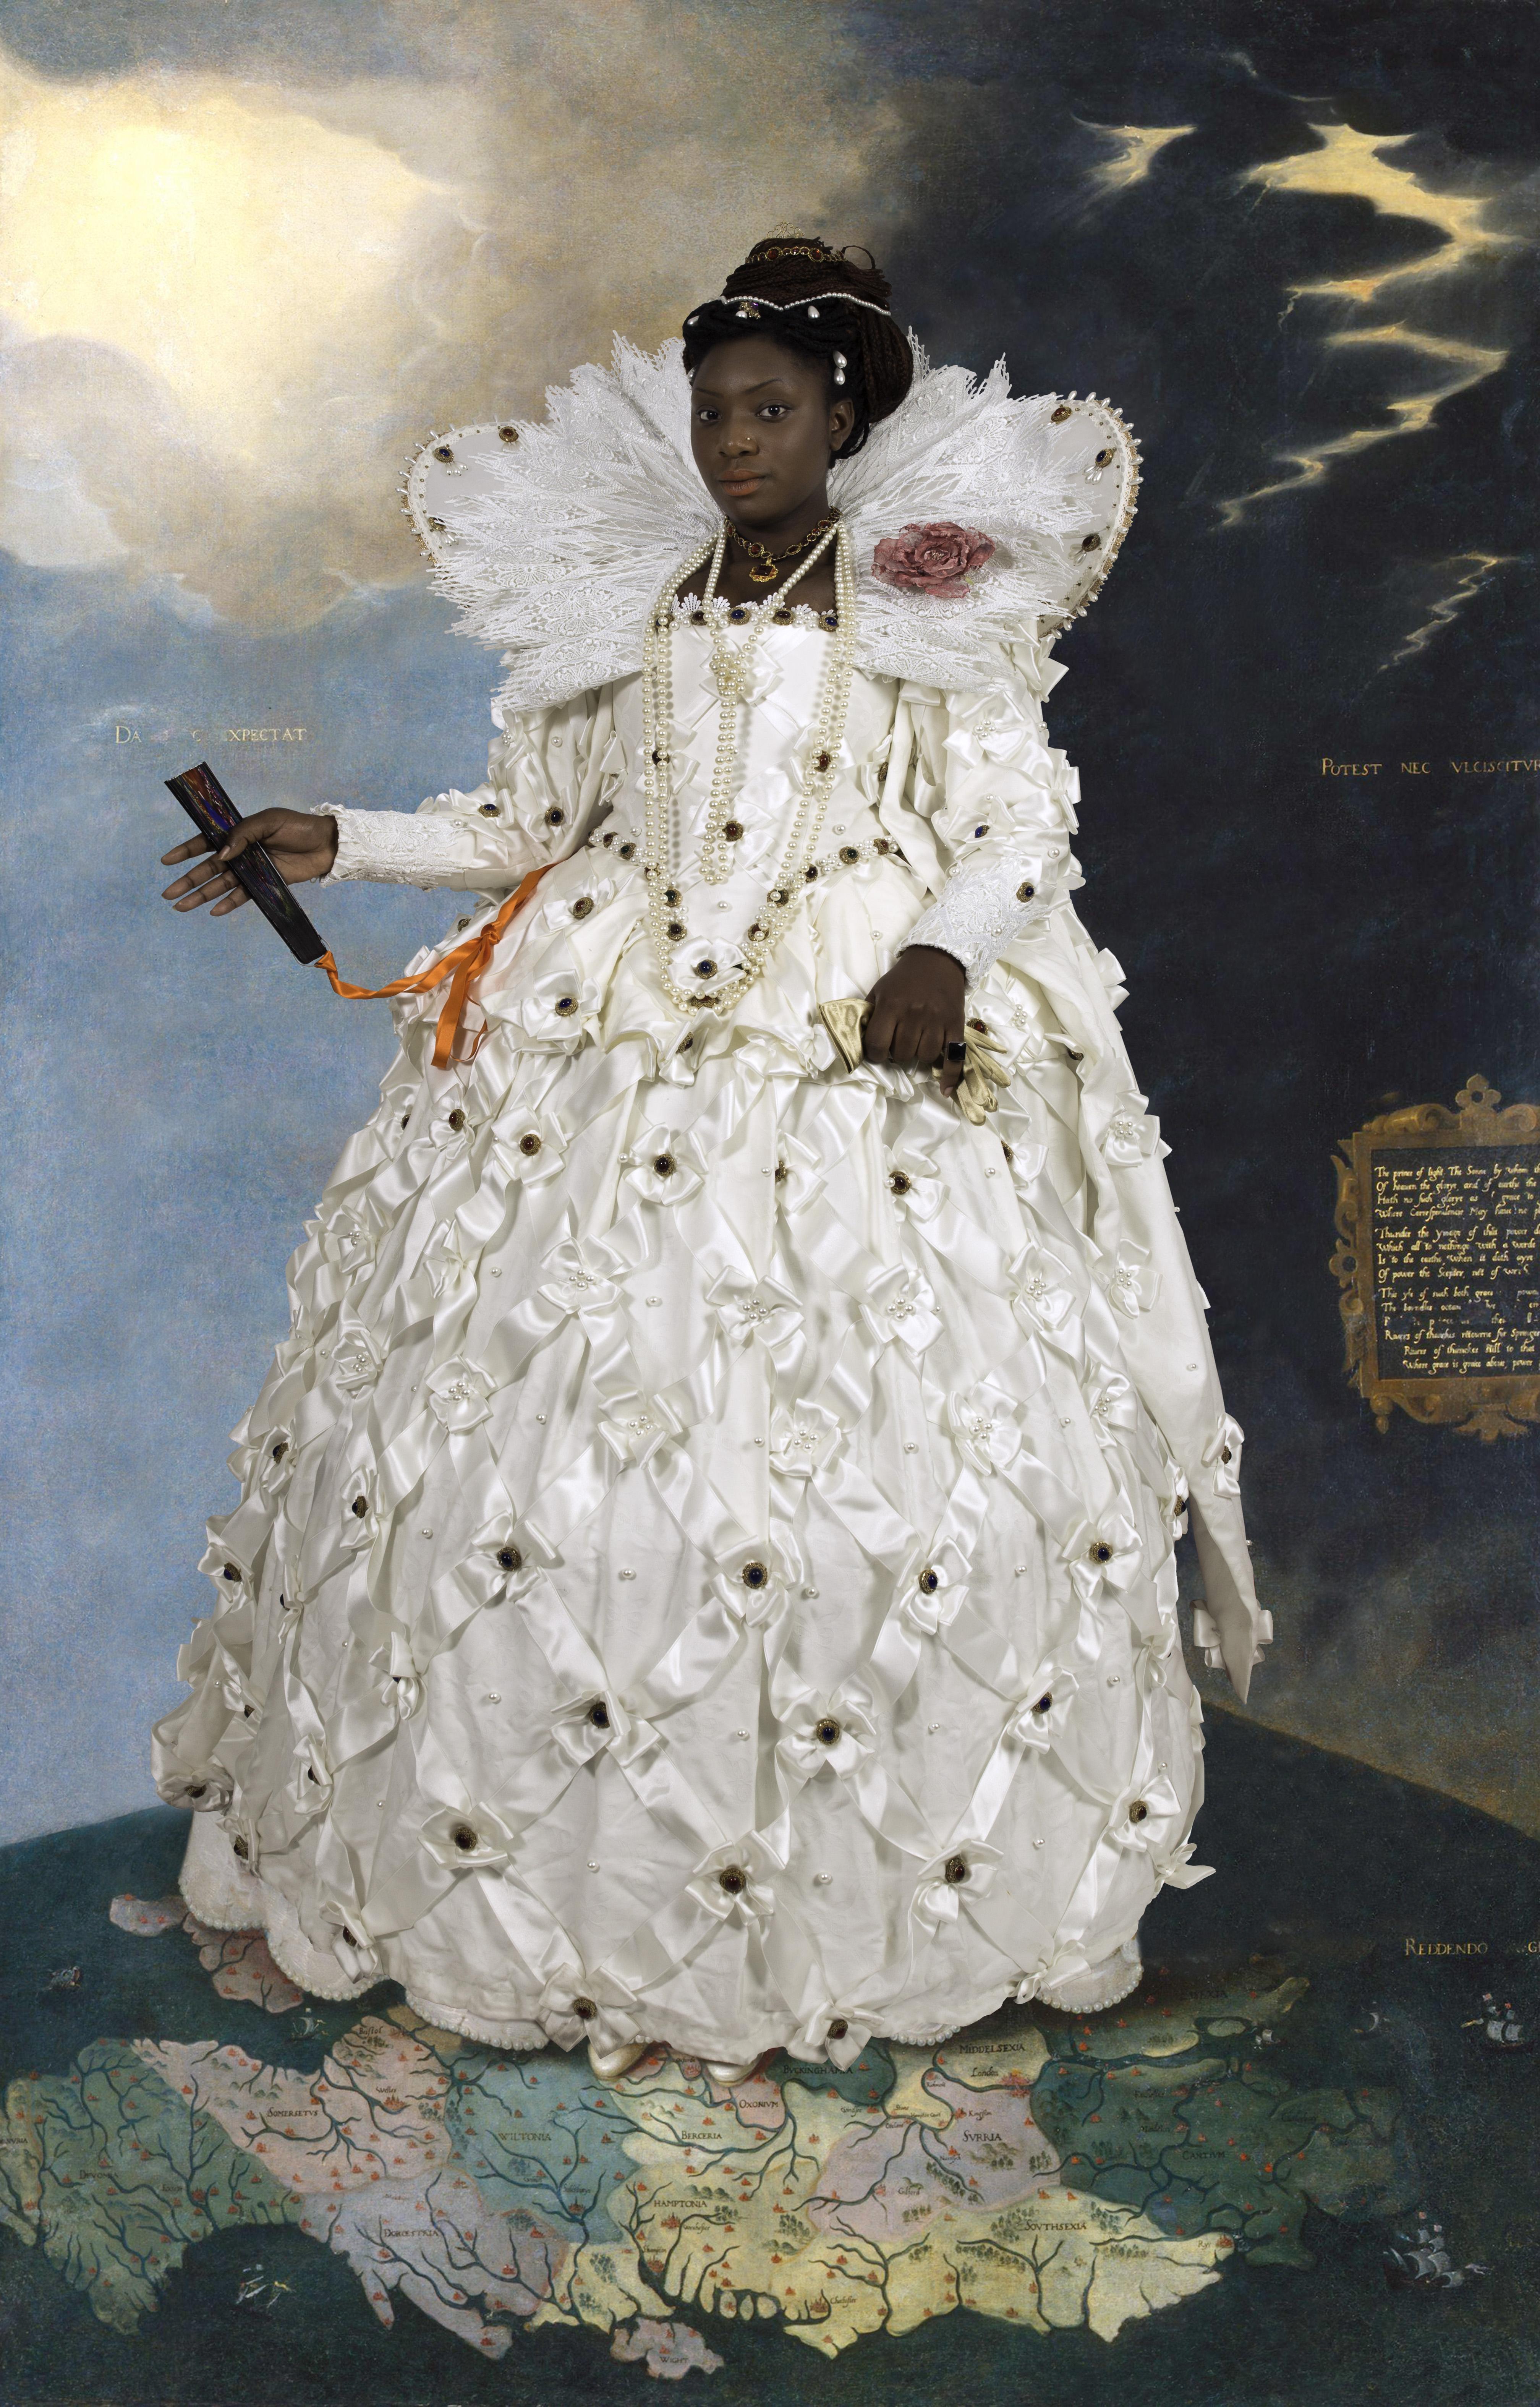 Ode to Gheeraerts' Portrait of Elizabeth I